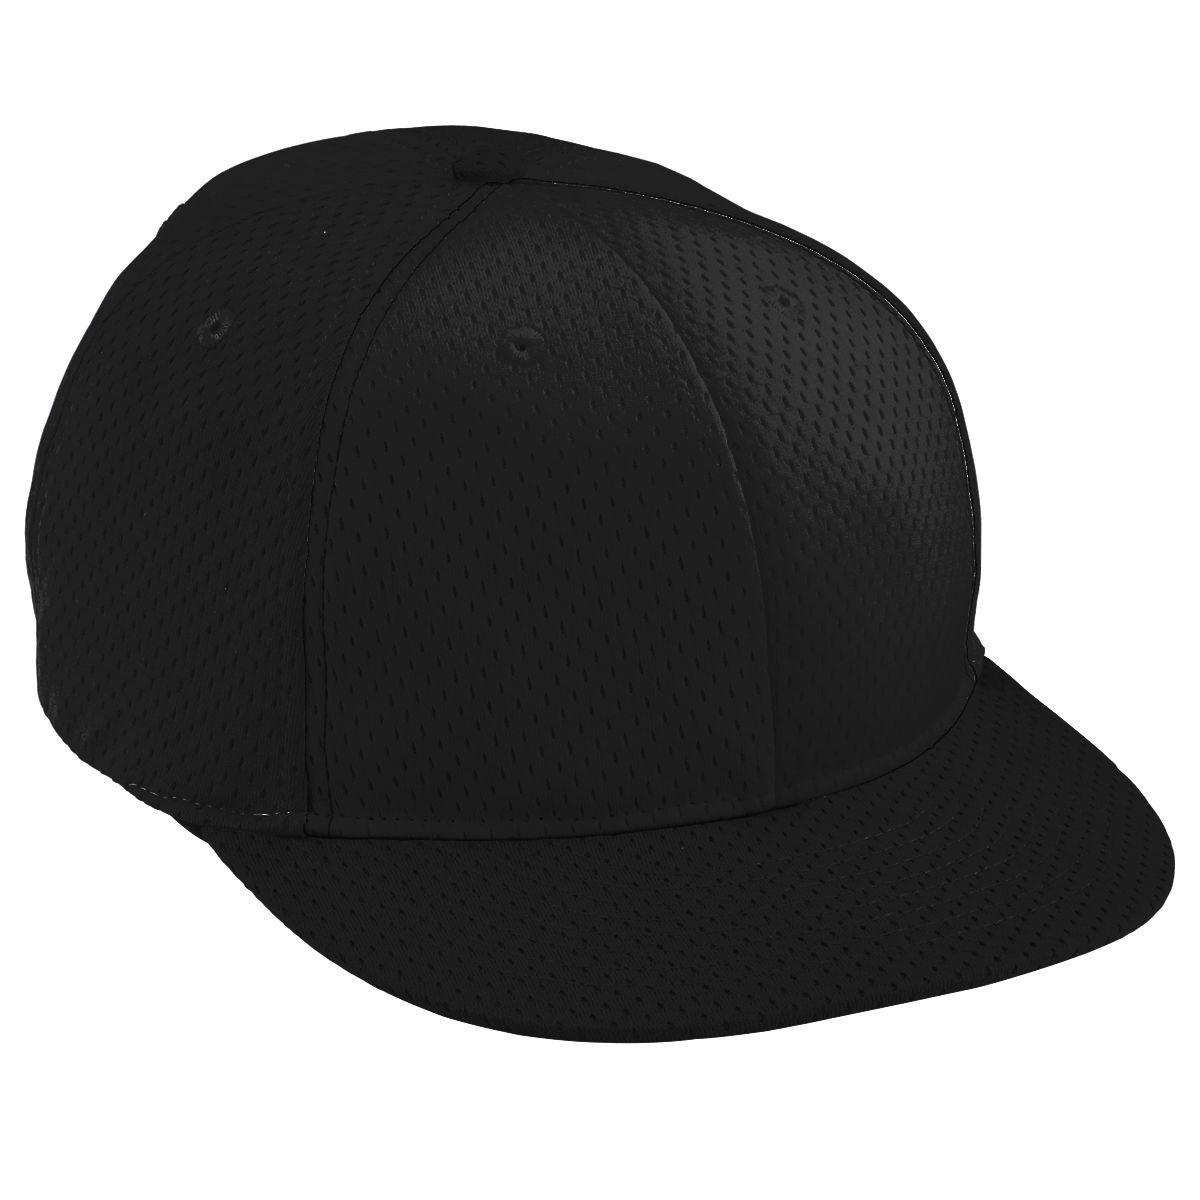 Adult Athletic Mesh Flat Bill Cap - BLACK/BLACK/BLACK